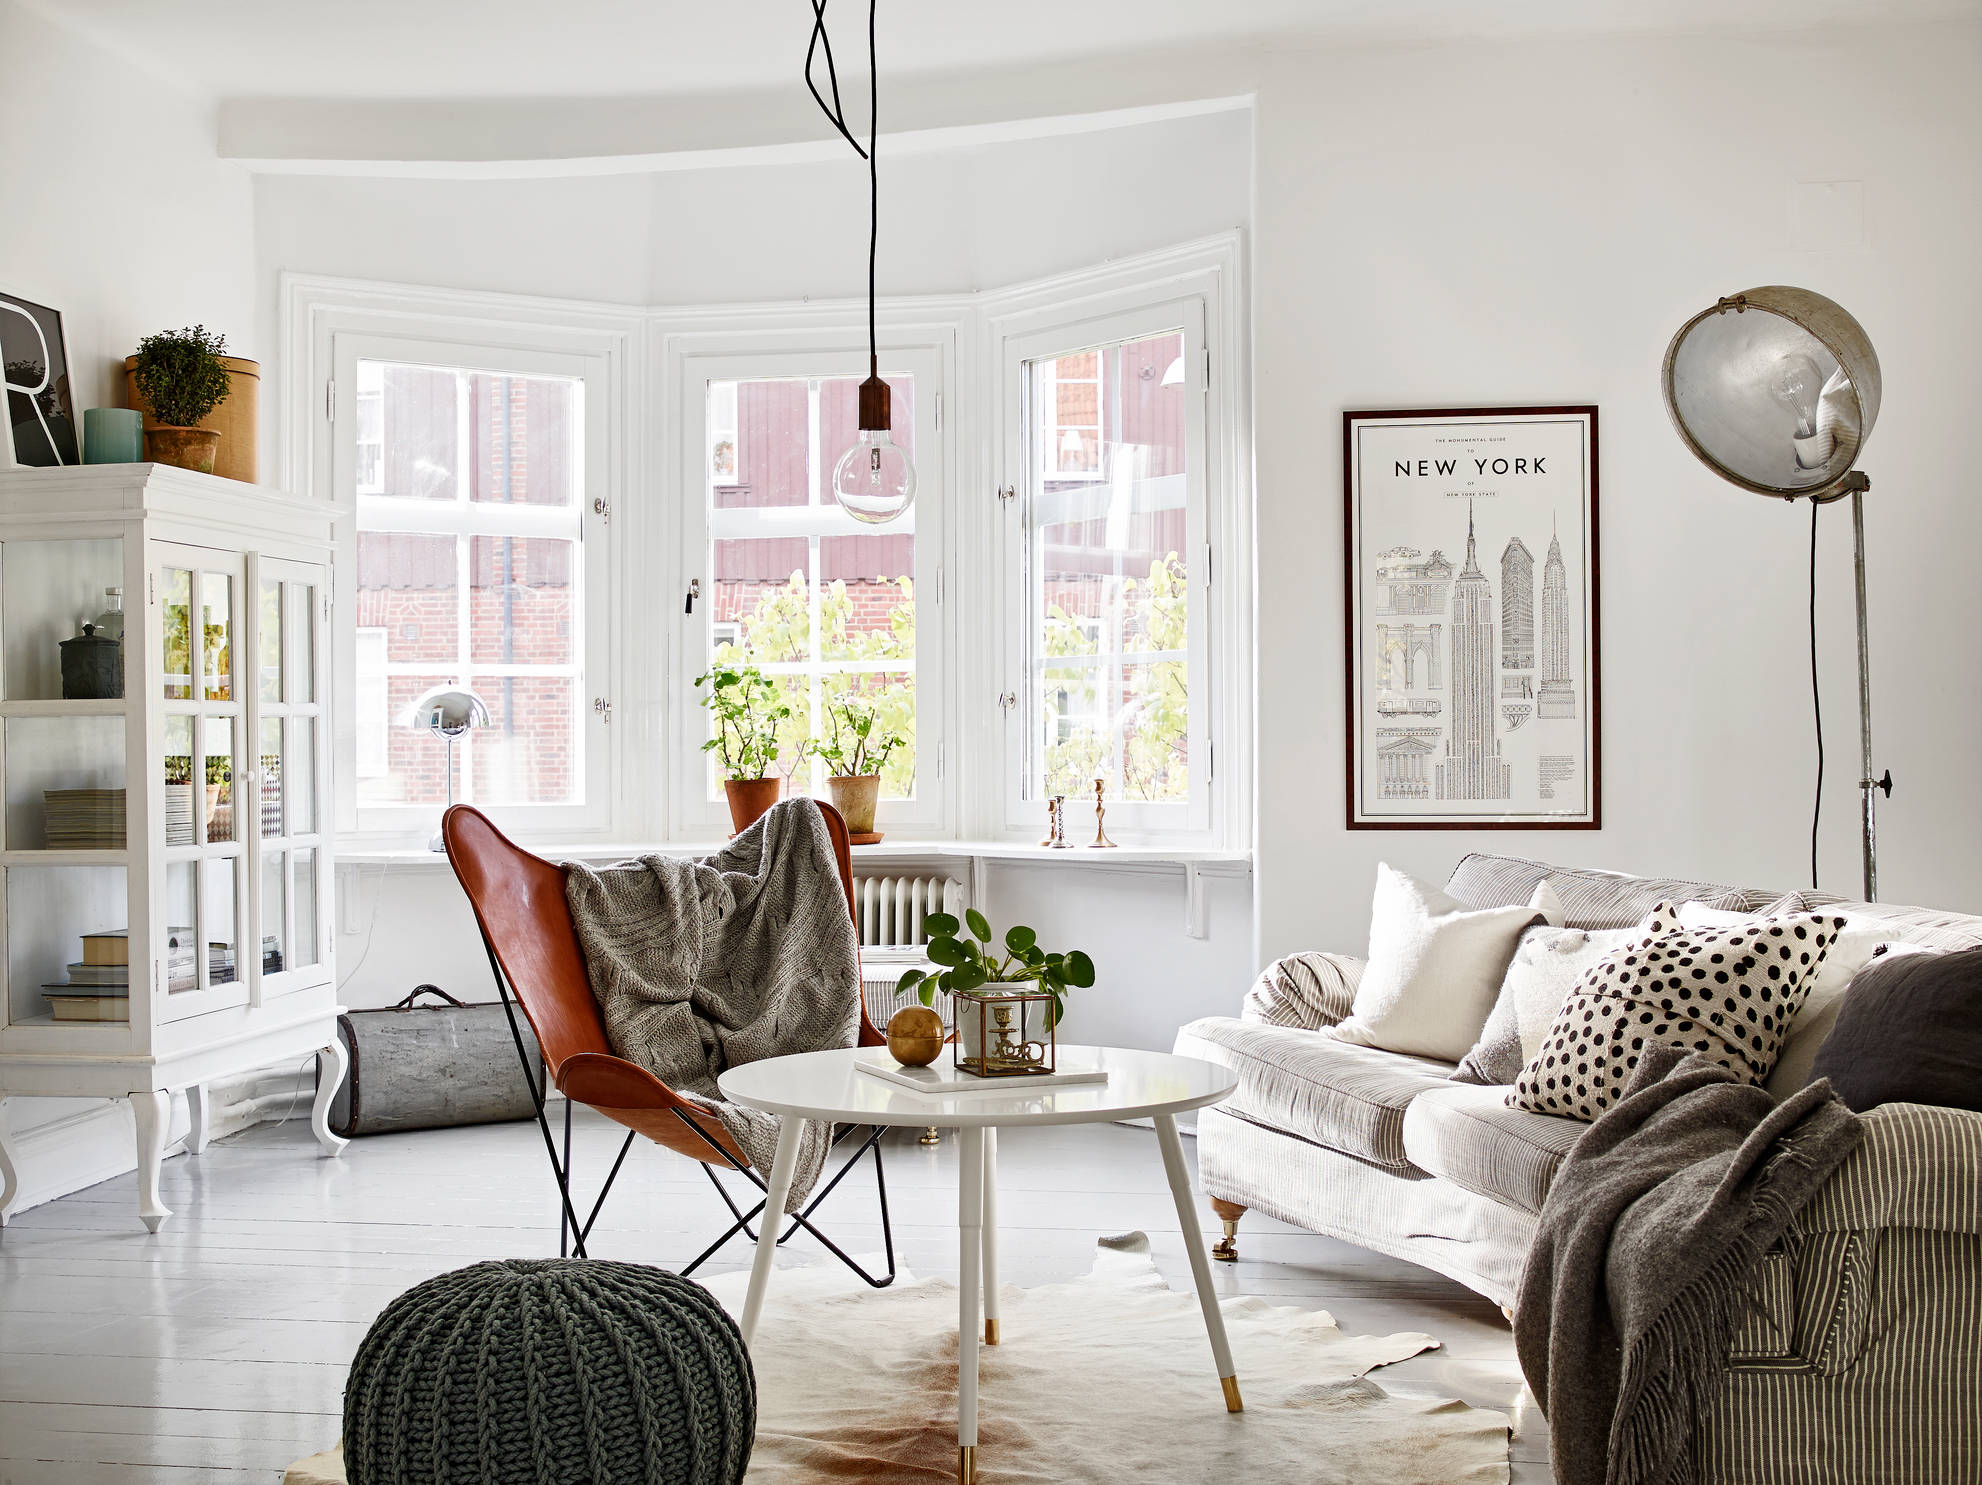 inspiration 2 pi ces design un l gant appartement su dois guten morgwen. Black Bedroom Furniture Sets. Home Design Ideas